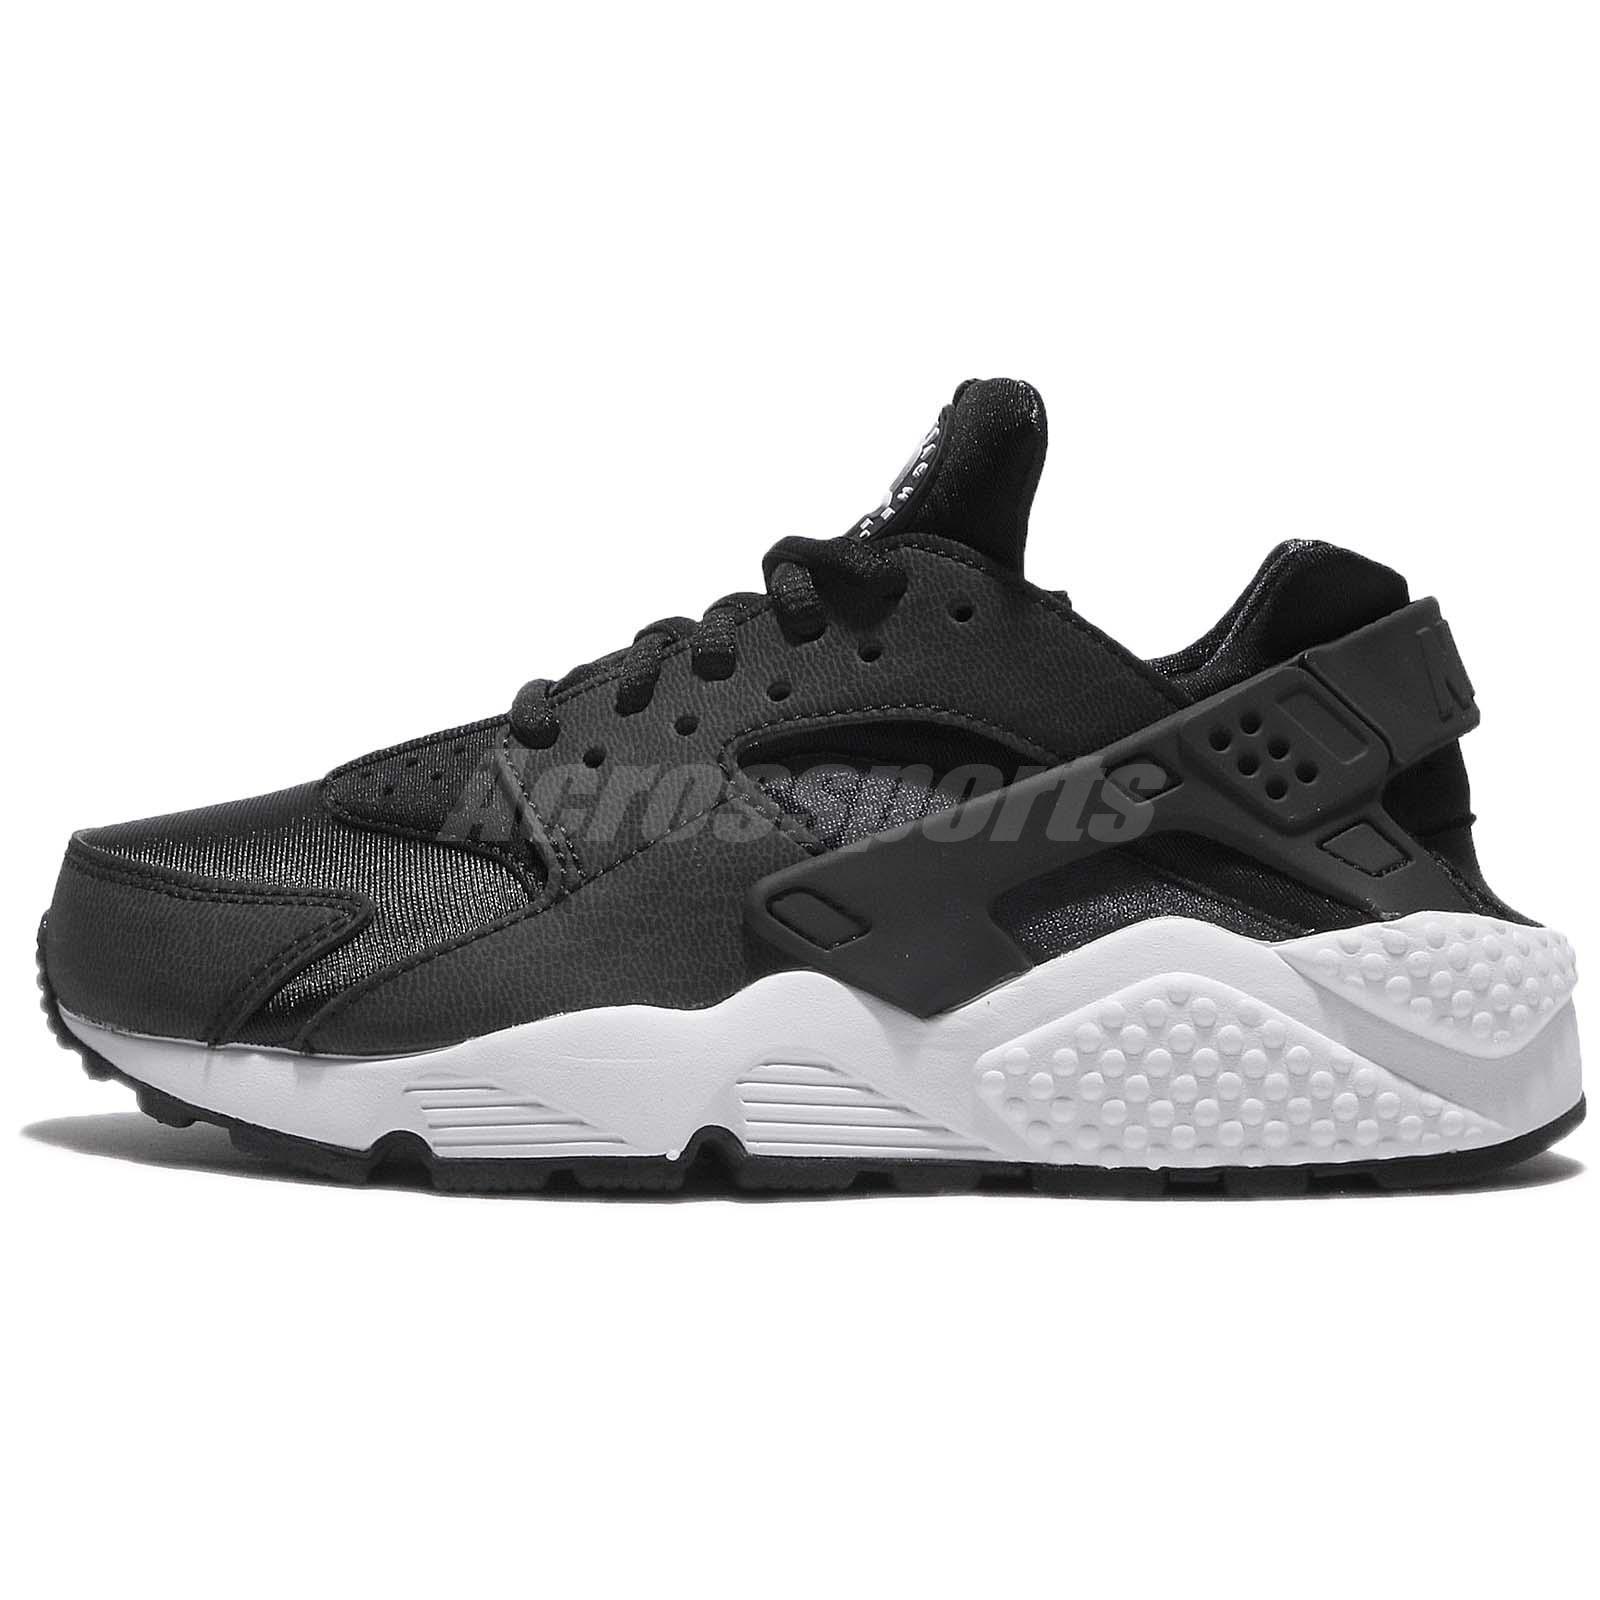 best service 0b929 17809 Nike Wmns Air Huarache Run Black White Women Running Shoes Sneakers  634835-006